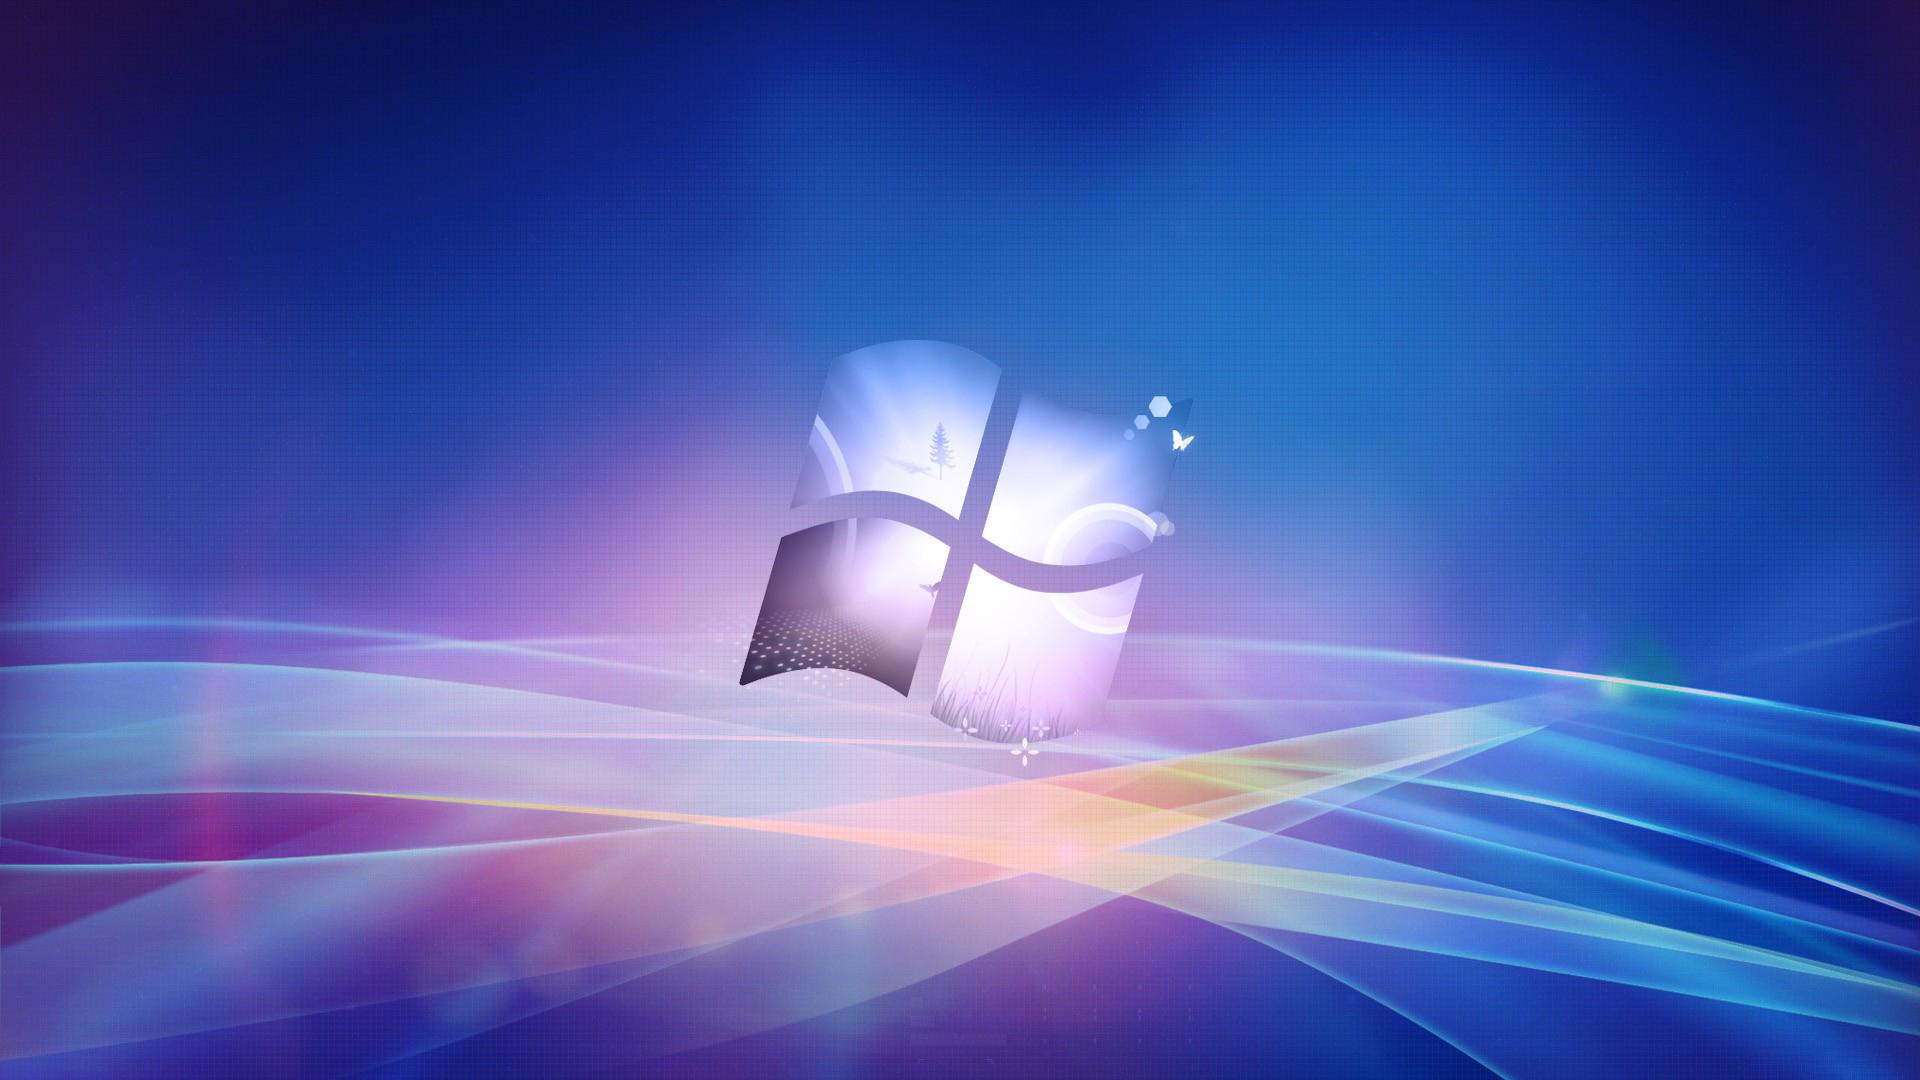 Windows Dream загрузить